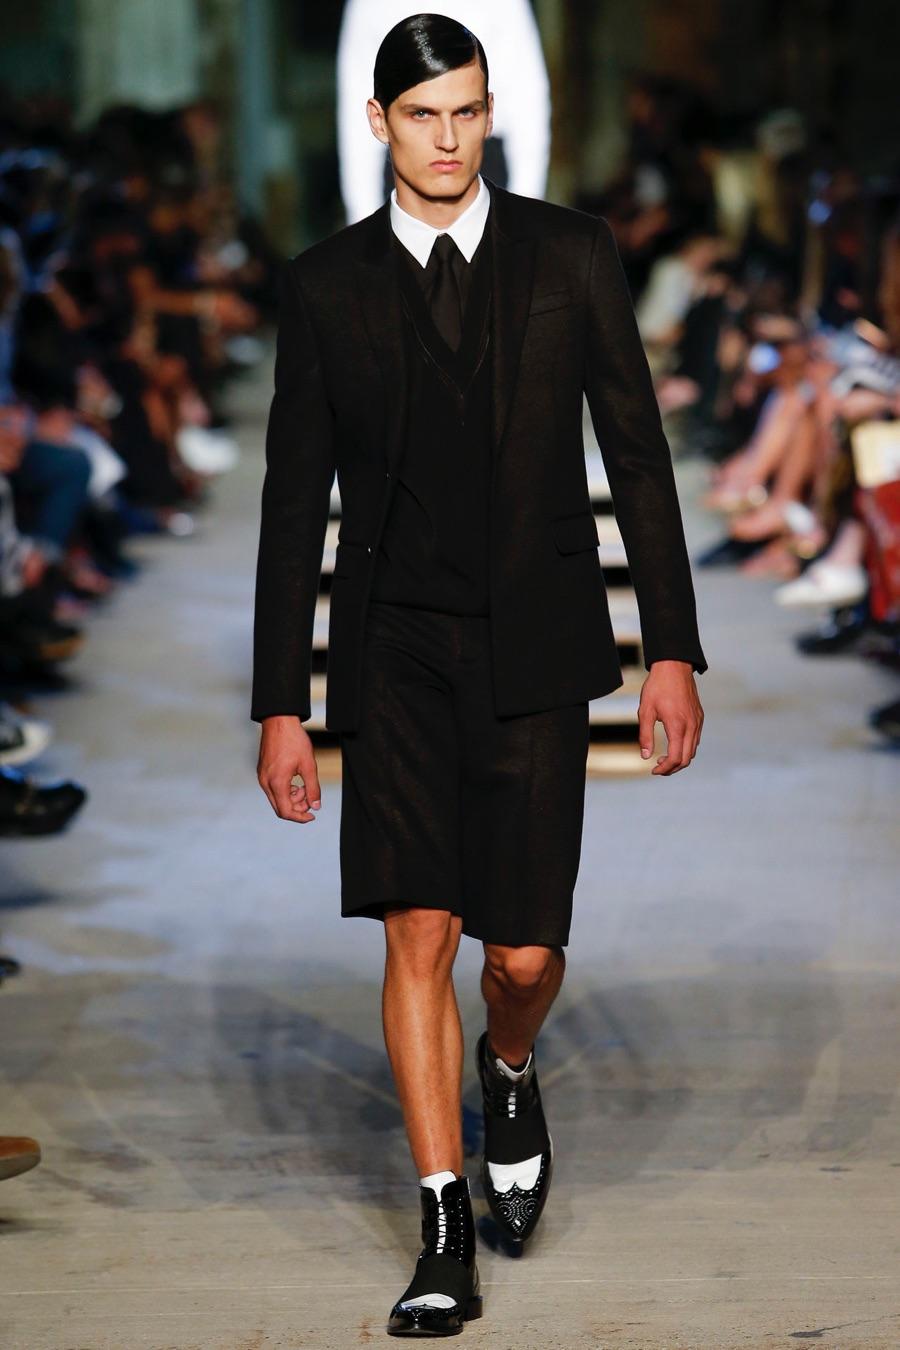 Givenchy-Spring-Summer-2016-Menswear-Collection-New-York-Fashion-Week-008.jpg